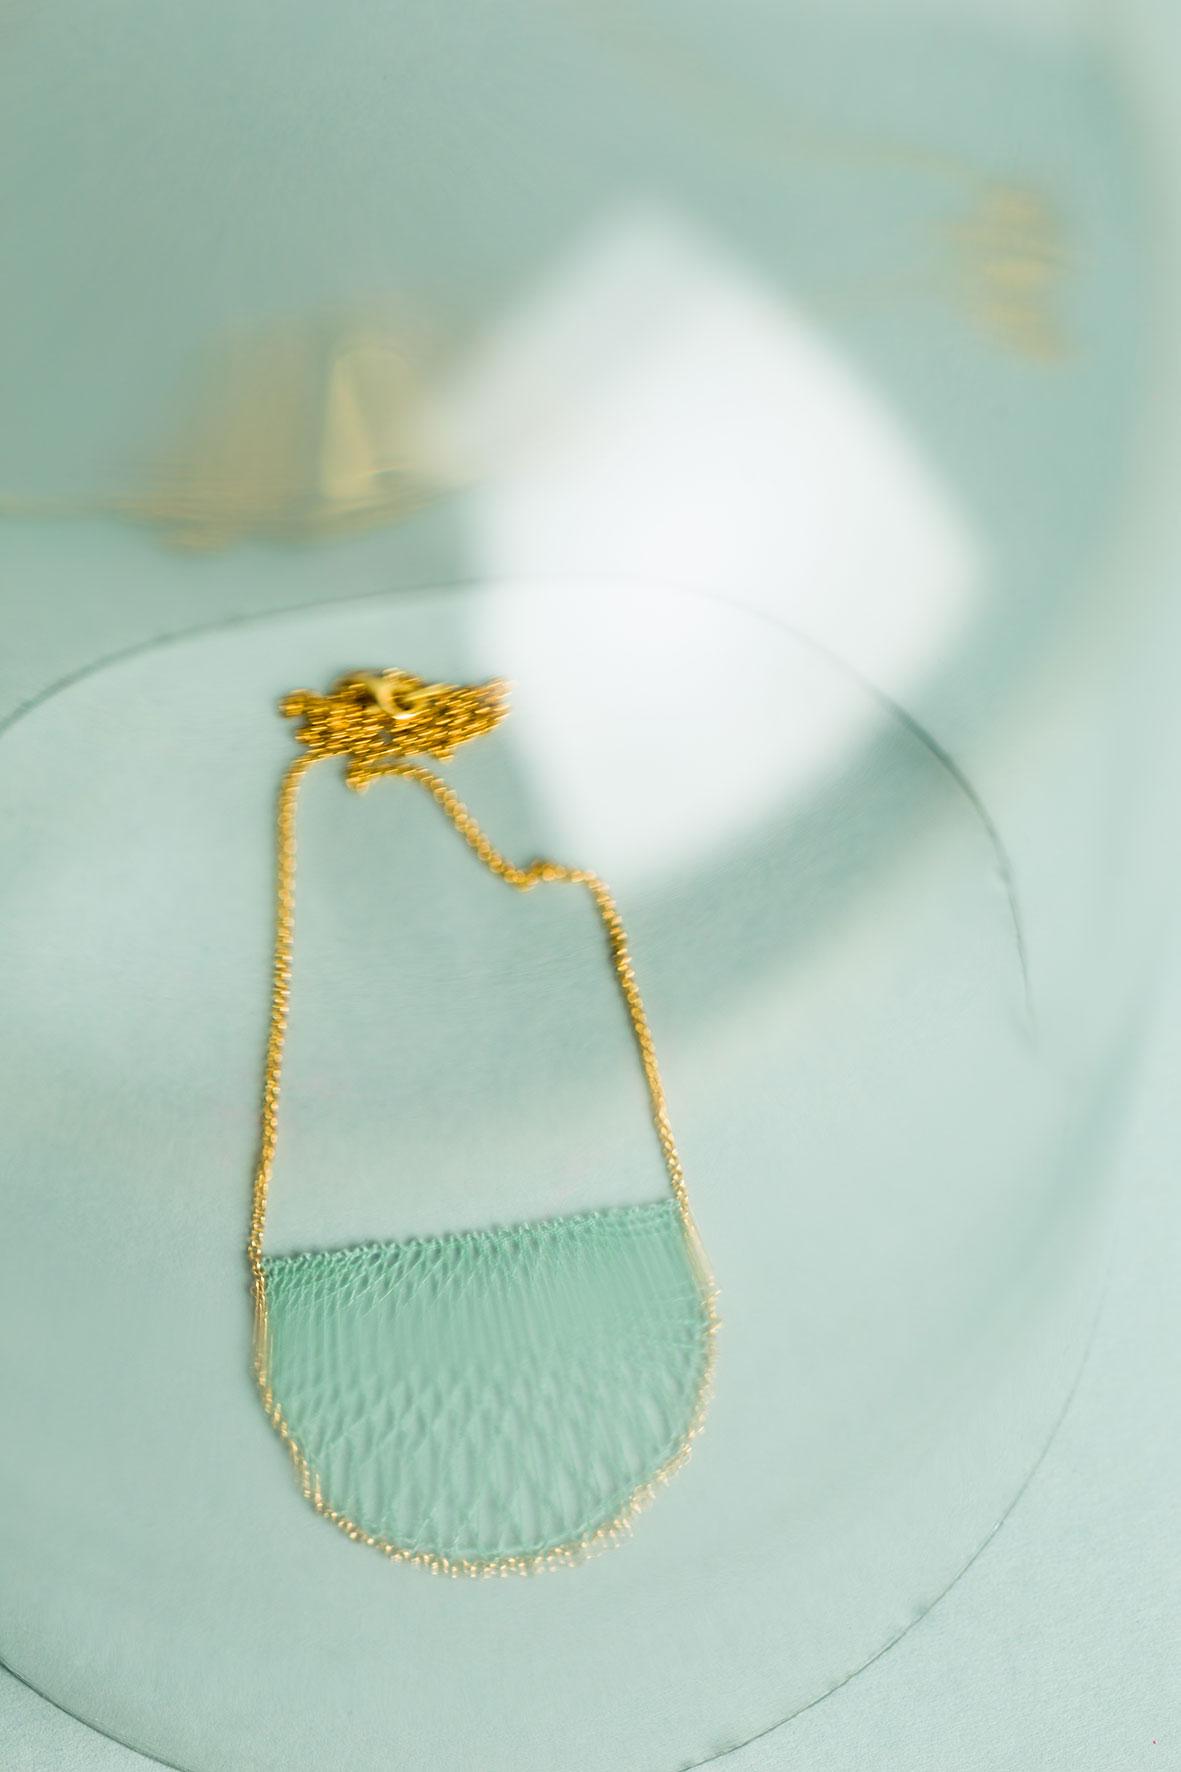 Inlace-Jewelry-13